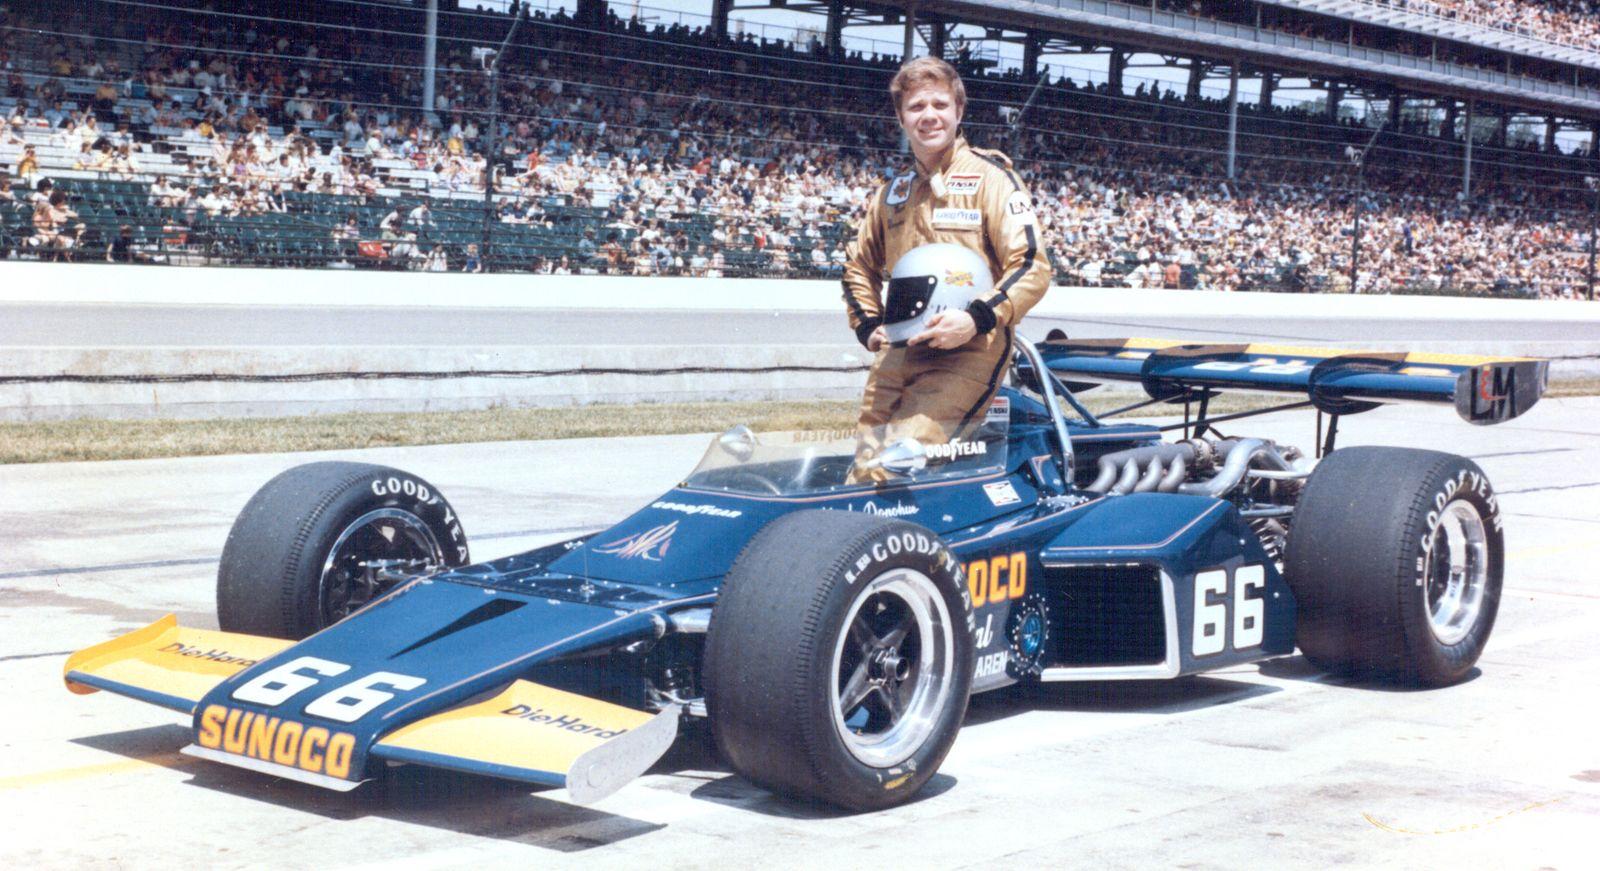 Mark Donohue og Penske Racing vant 1972 Indianapolis 500 Foto: Indianapolis Motor Speedway